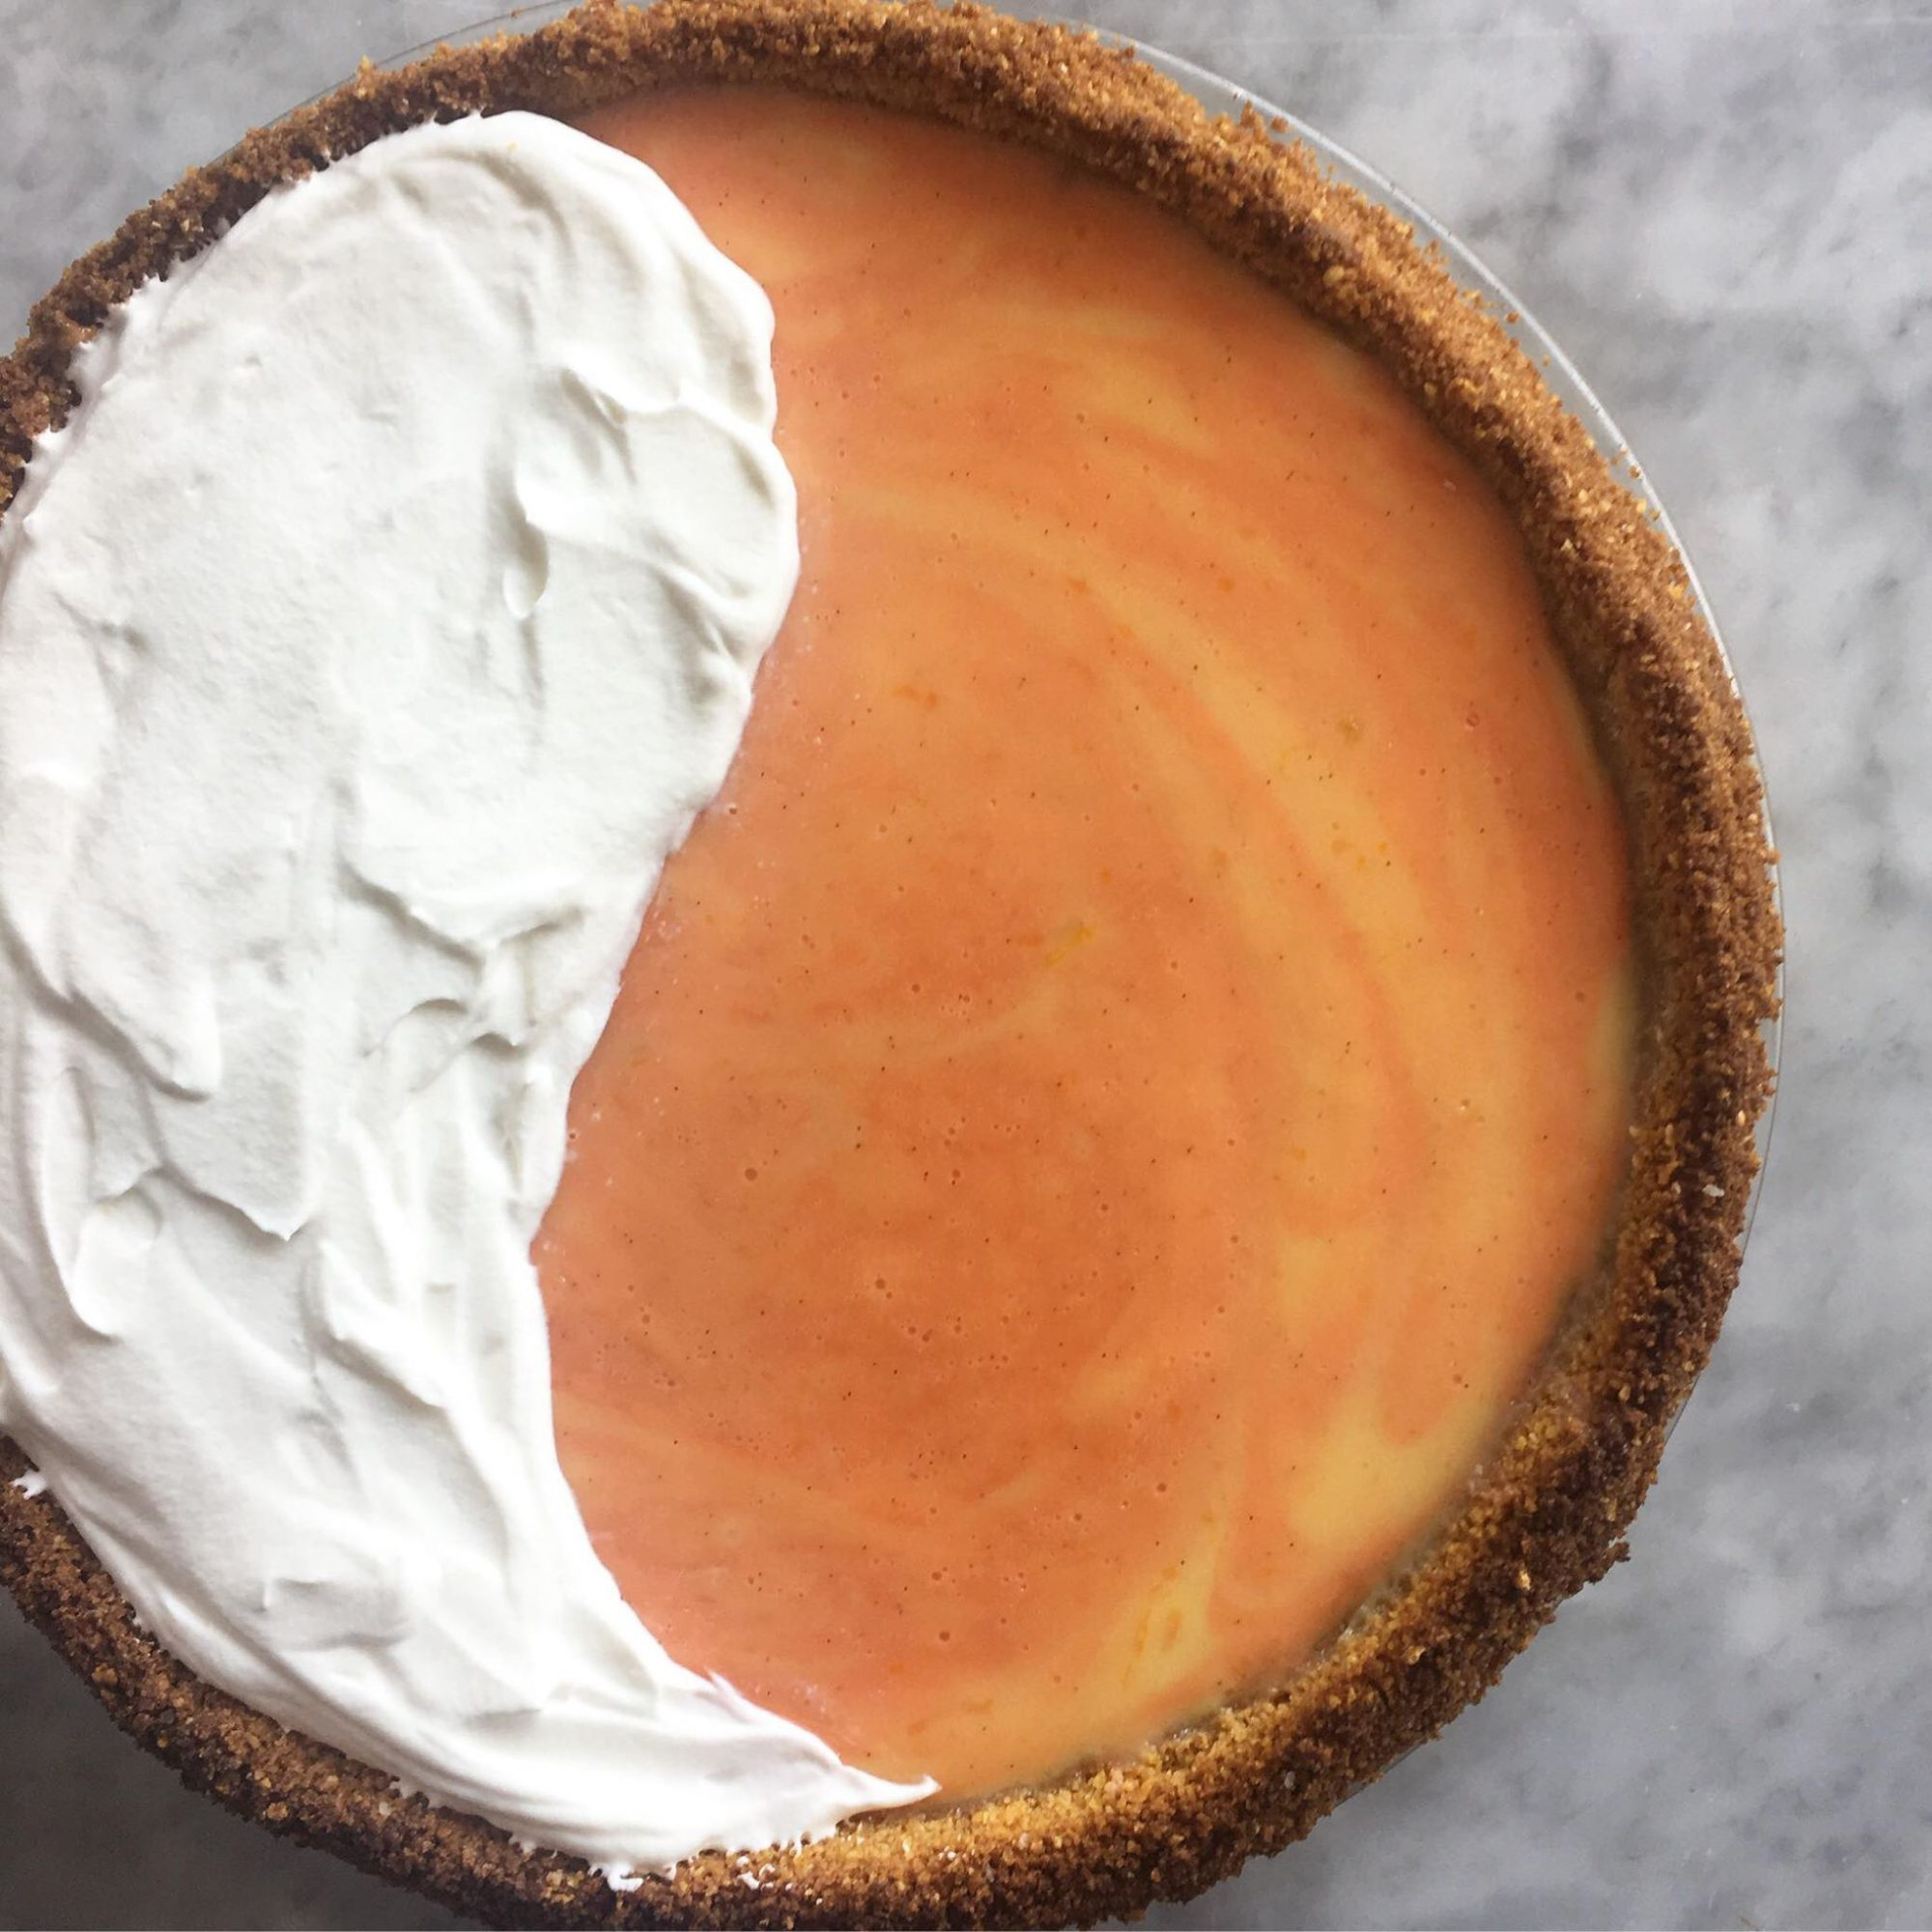 This Orange Cream Pie Tastes Just Like a Dreamsicle